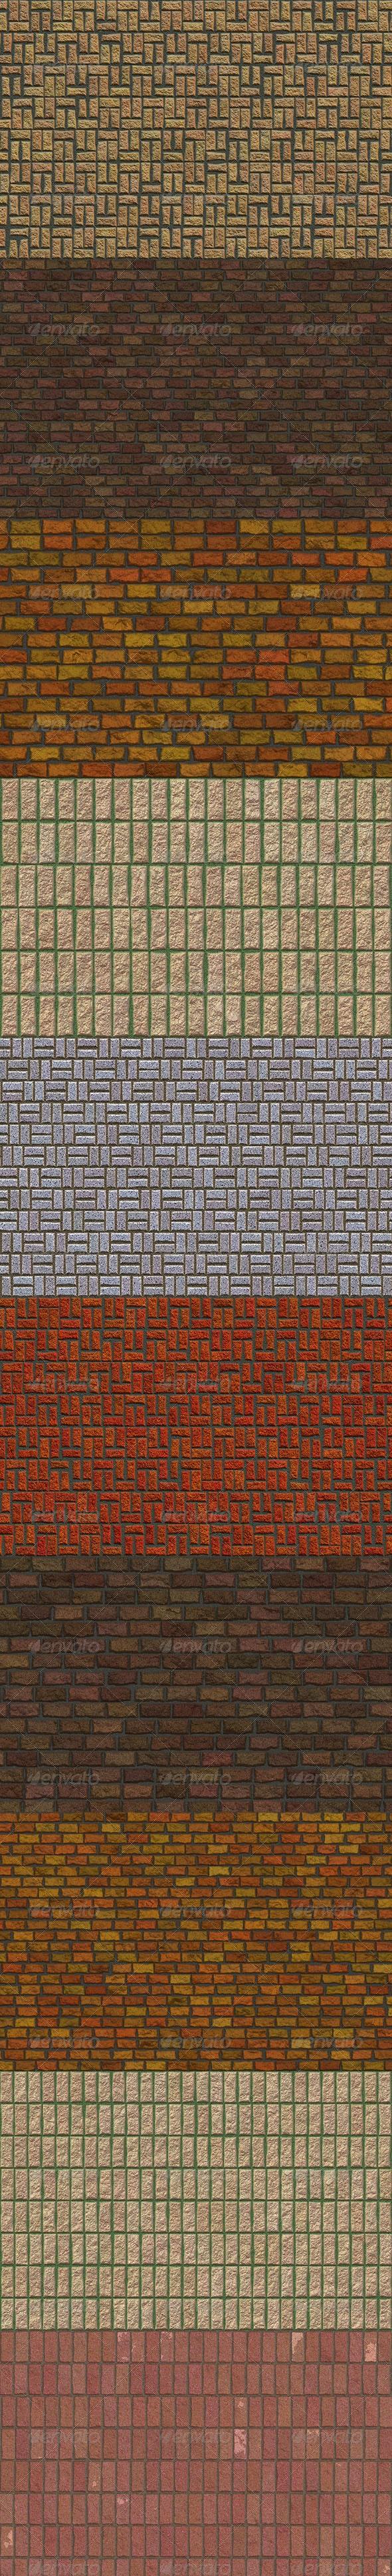 10 Brick Wall Textures Vol.1 - Stone Textures